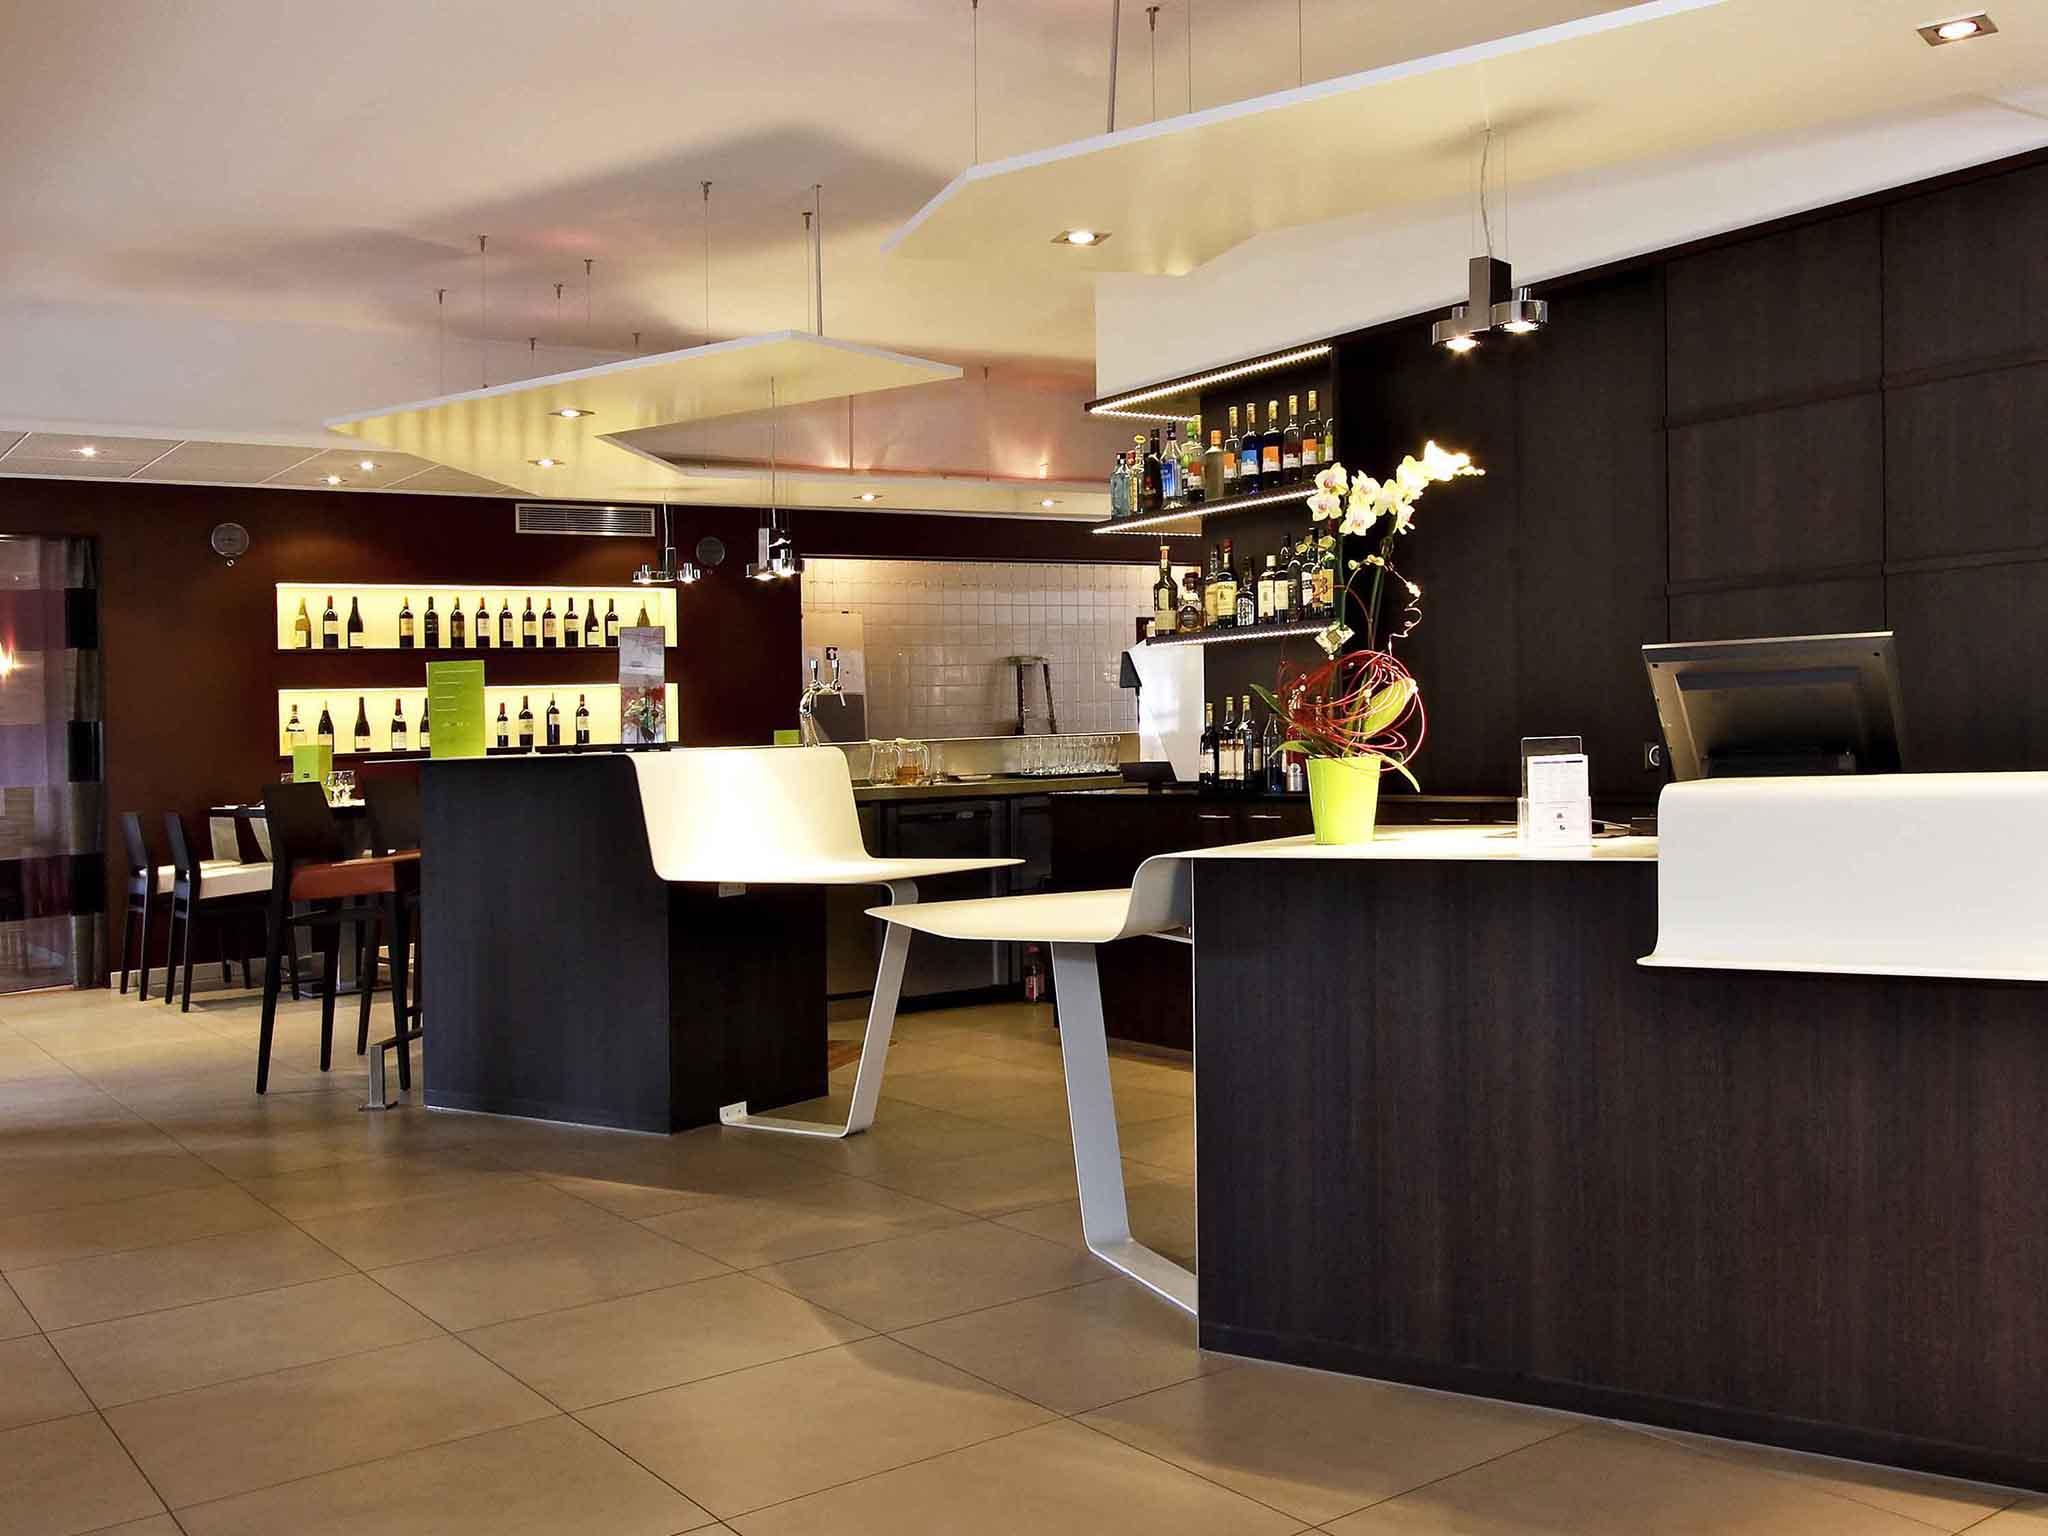 Hotel – Hotel Mercure Luxeuil Les Bains Hexagone